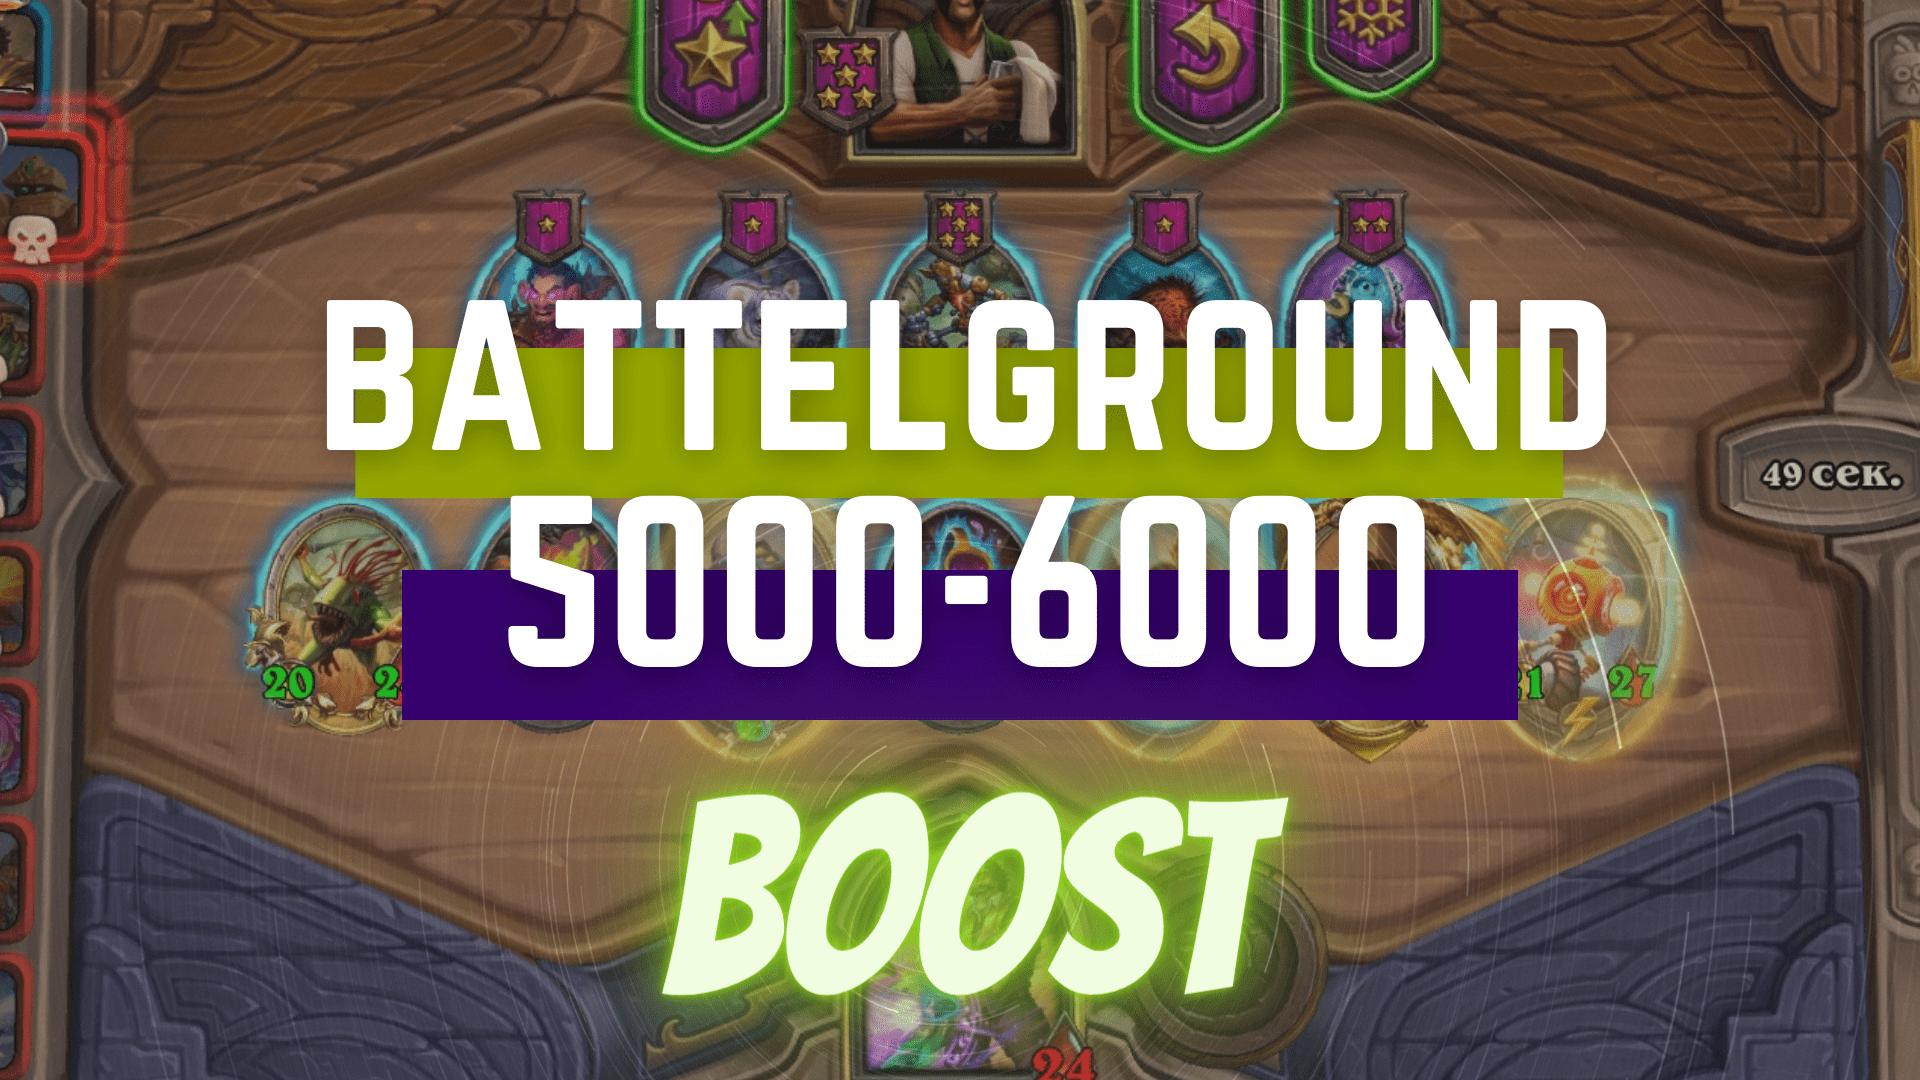 [Battlegrounds rating] Boost from 5000 to 6000 Zafari - e2p.com